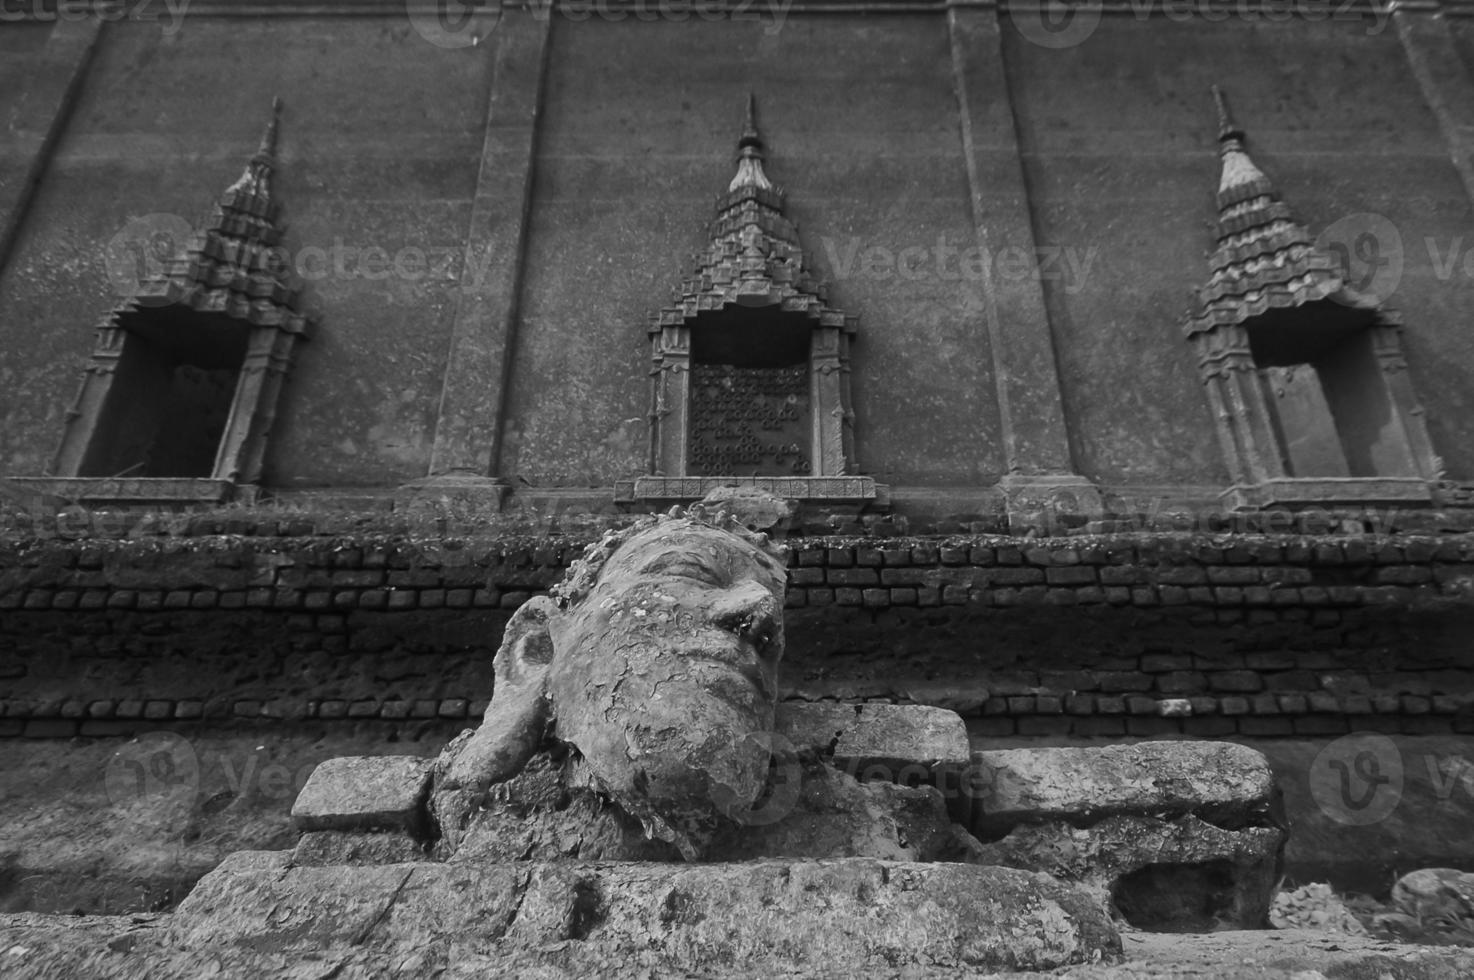 antigua estatua de la cabeza de Buda en la ruina del templo submarino foto